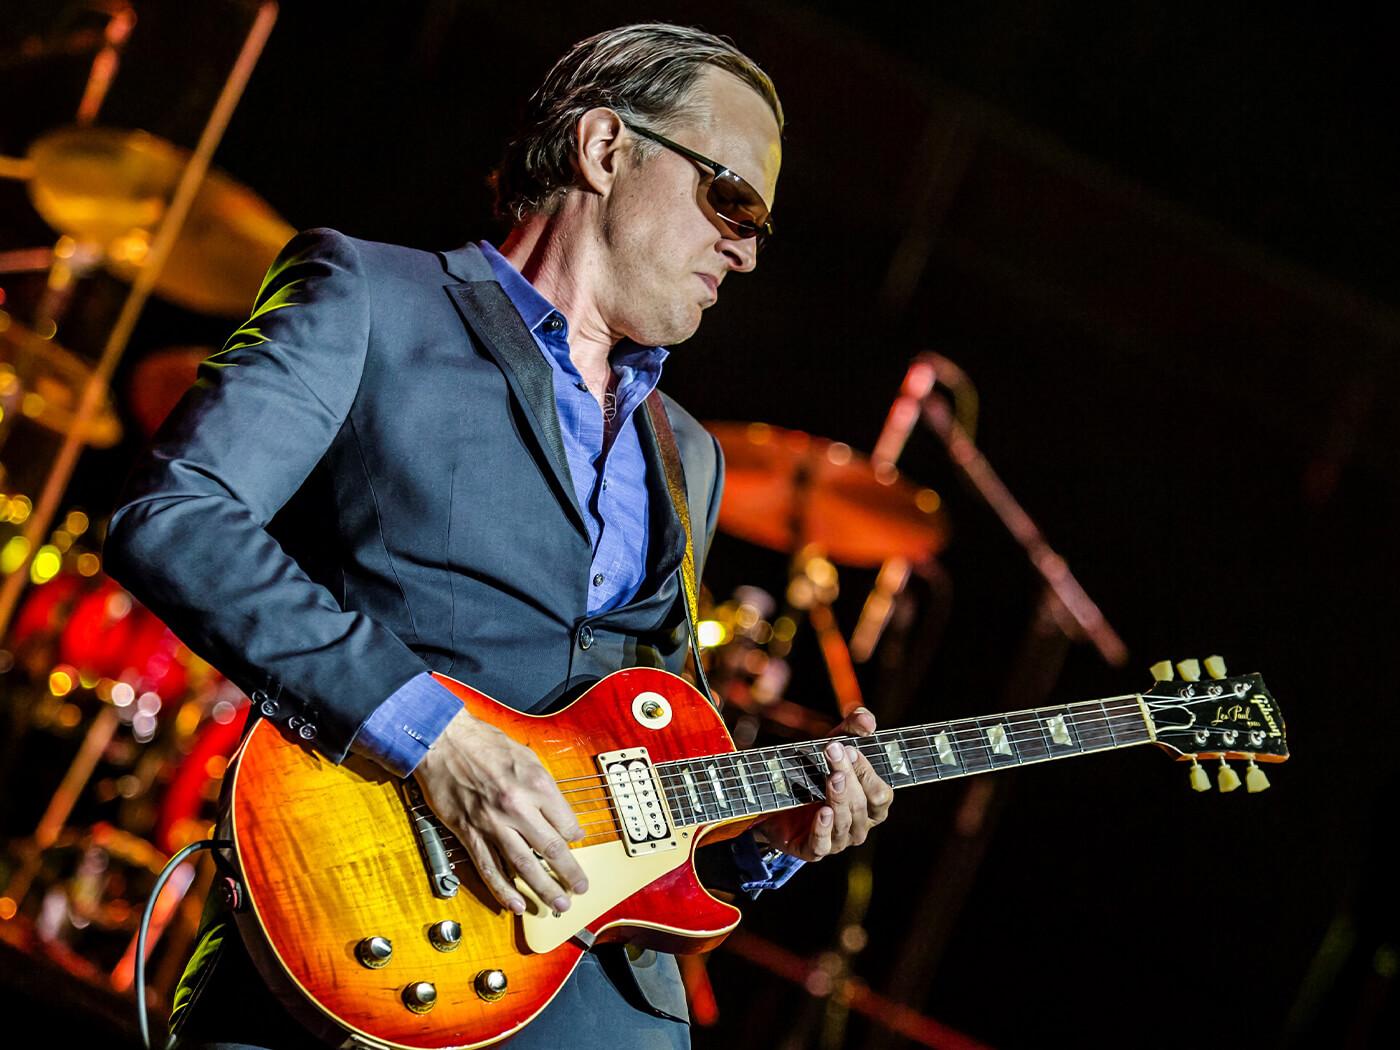 Joe Bonamassa puts out surprise single, A Conversation With Alice |  Guitar.com | All Things Guitar